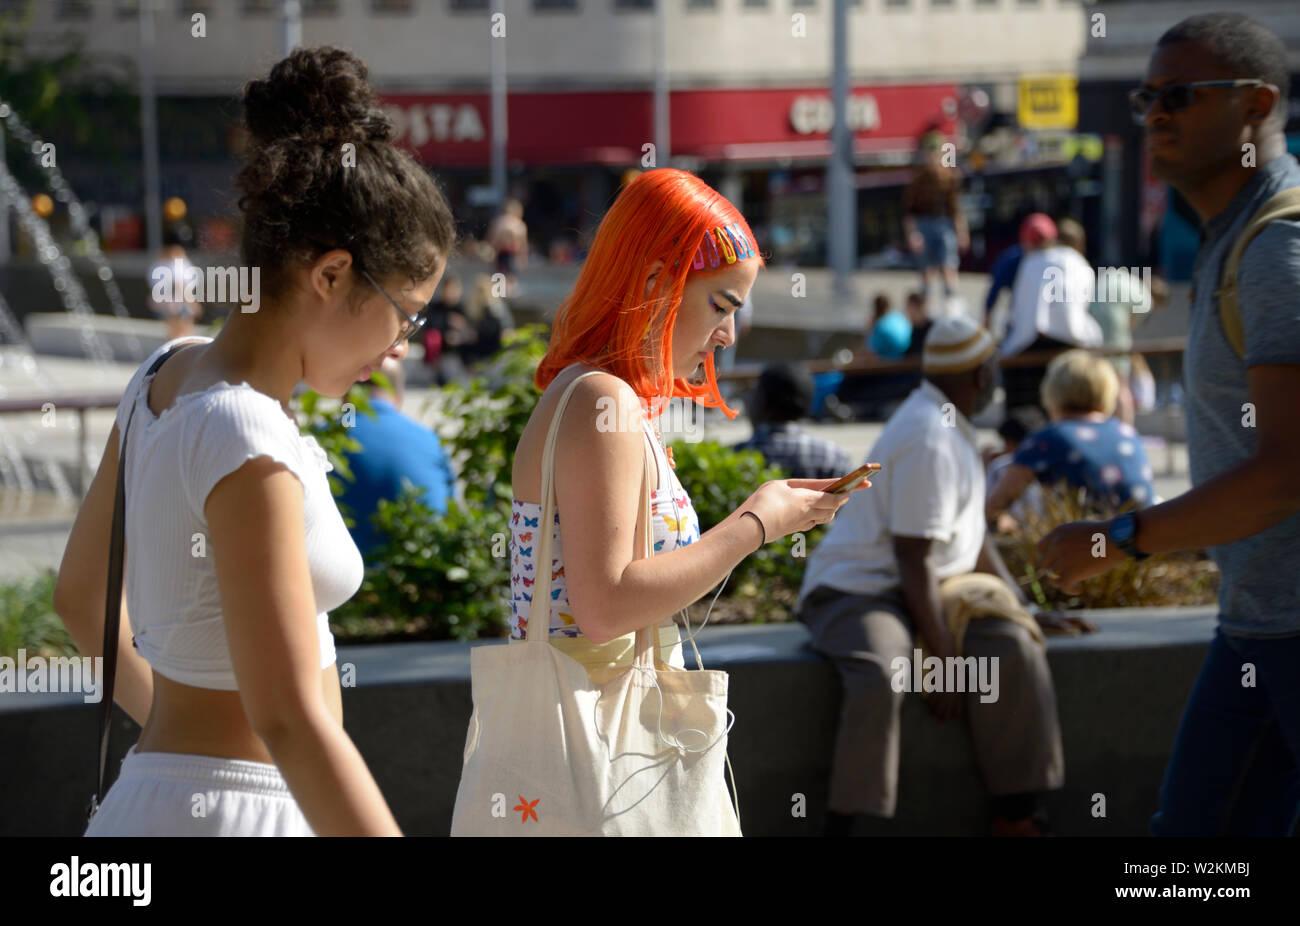 Two girls walking, one with orange hair, on phone - Stock Image